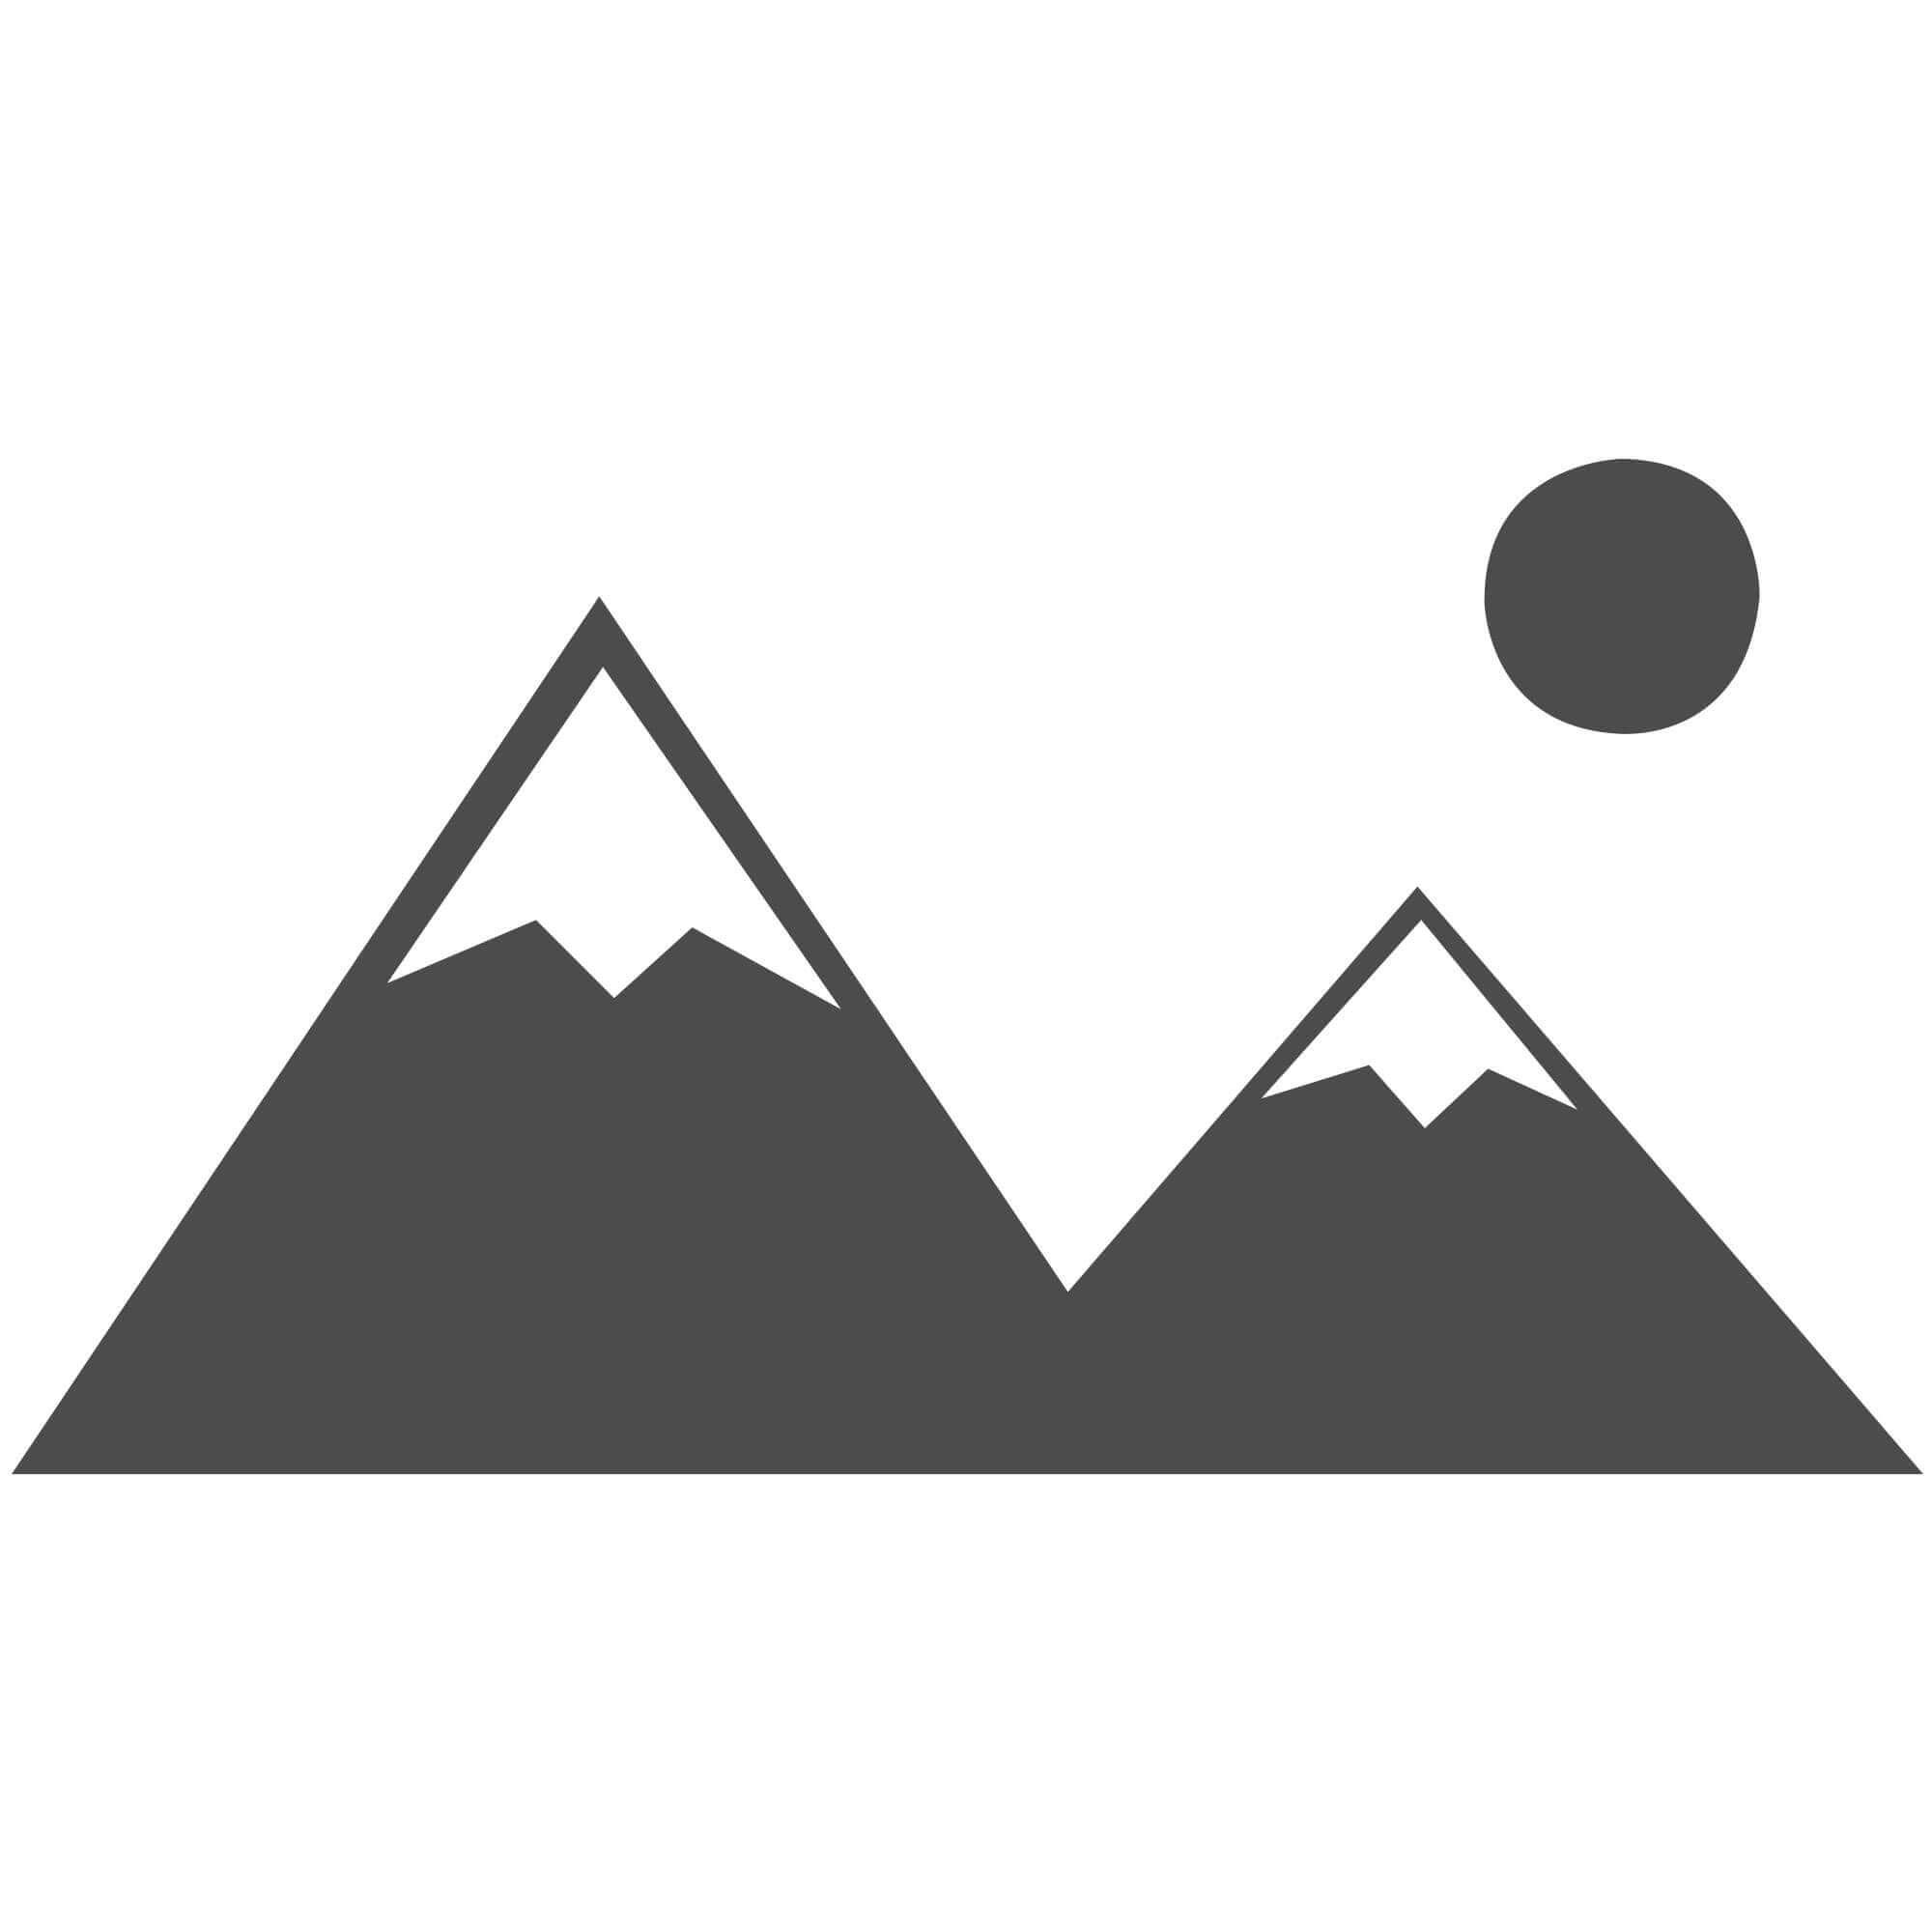 "Lulu Shaggy Rug - Sorbet Red - Size 200 x 290 cm (6'7"" x 9'6"")"